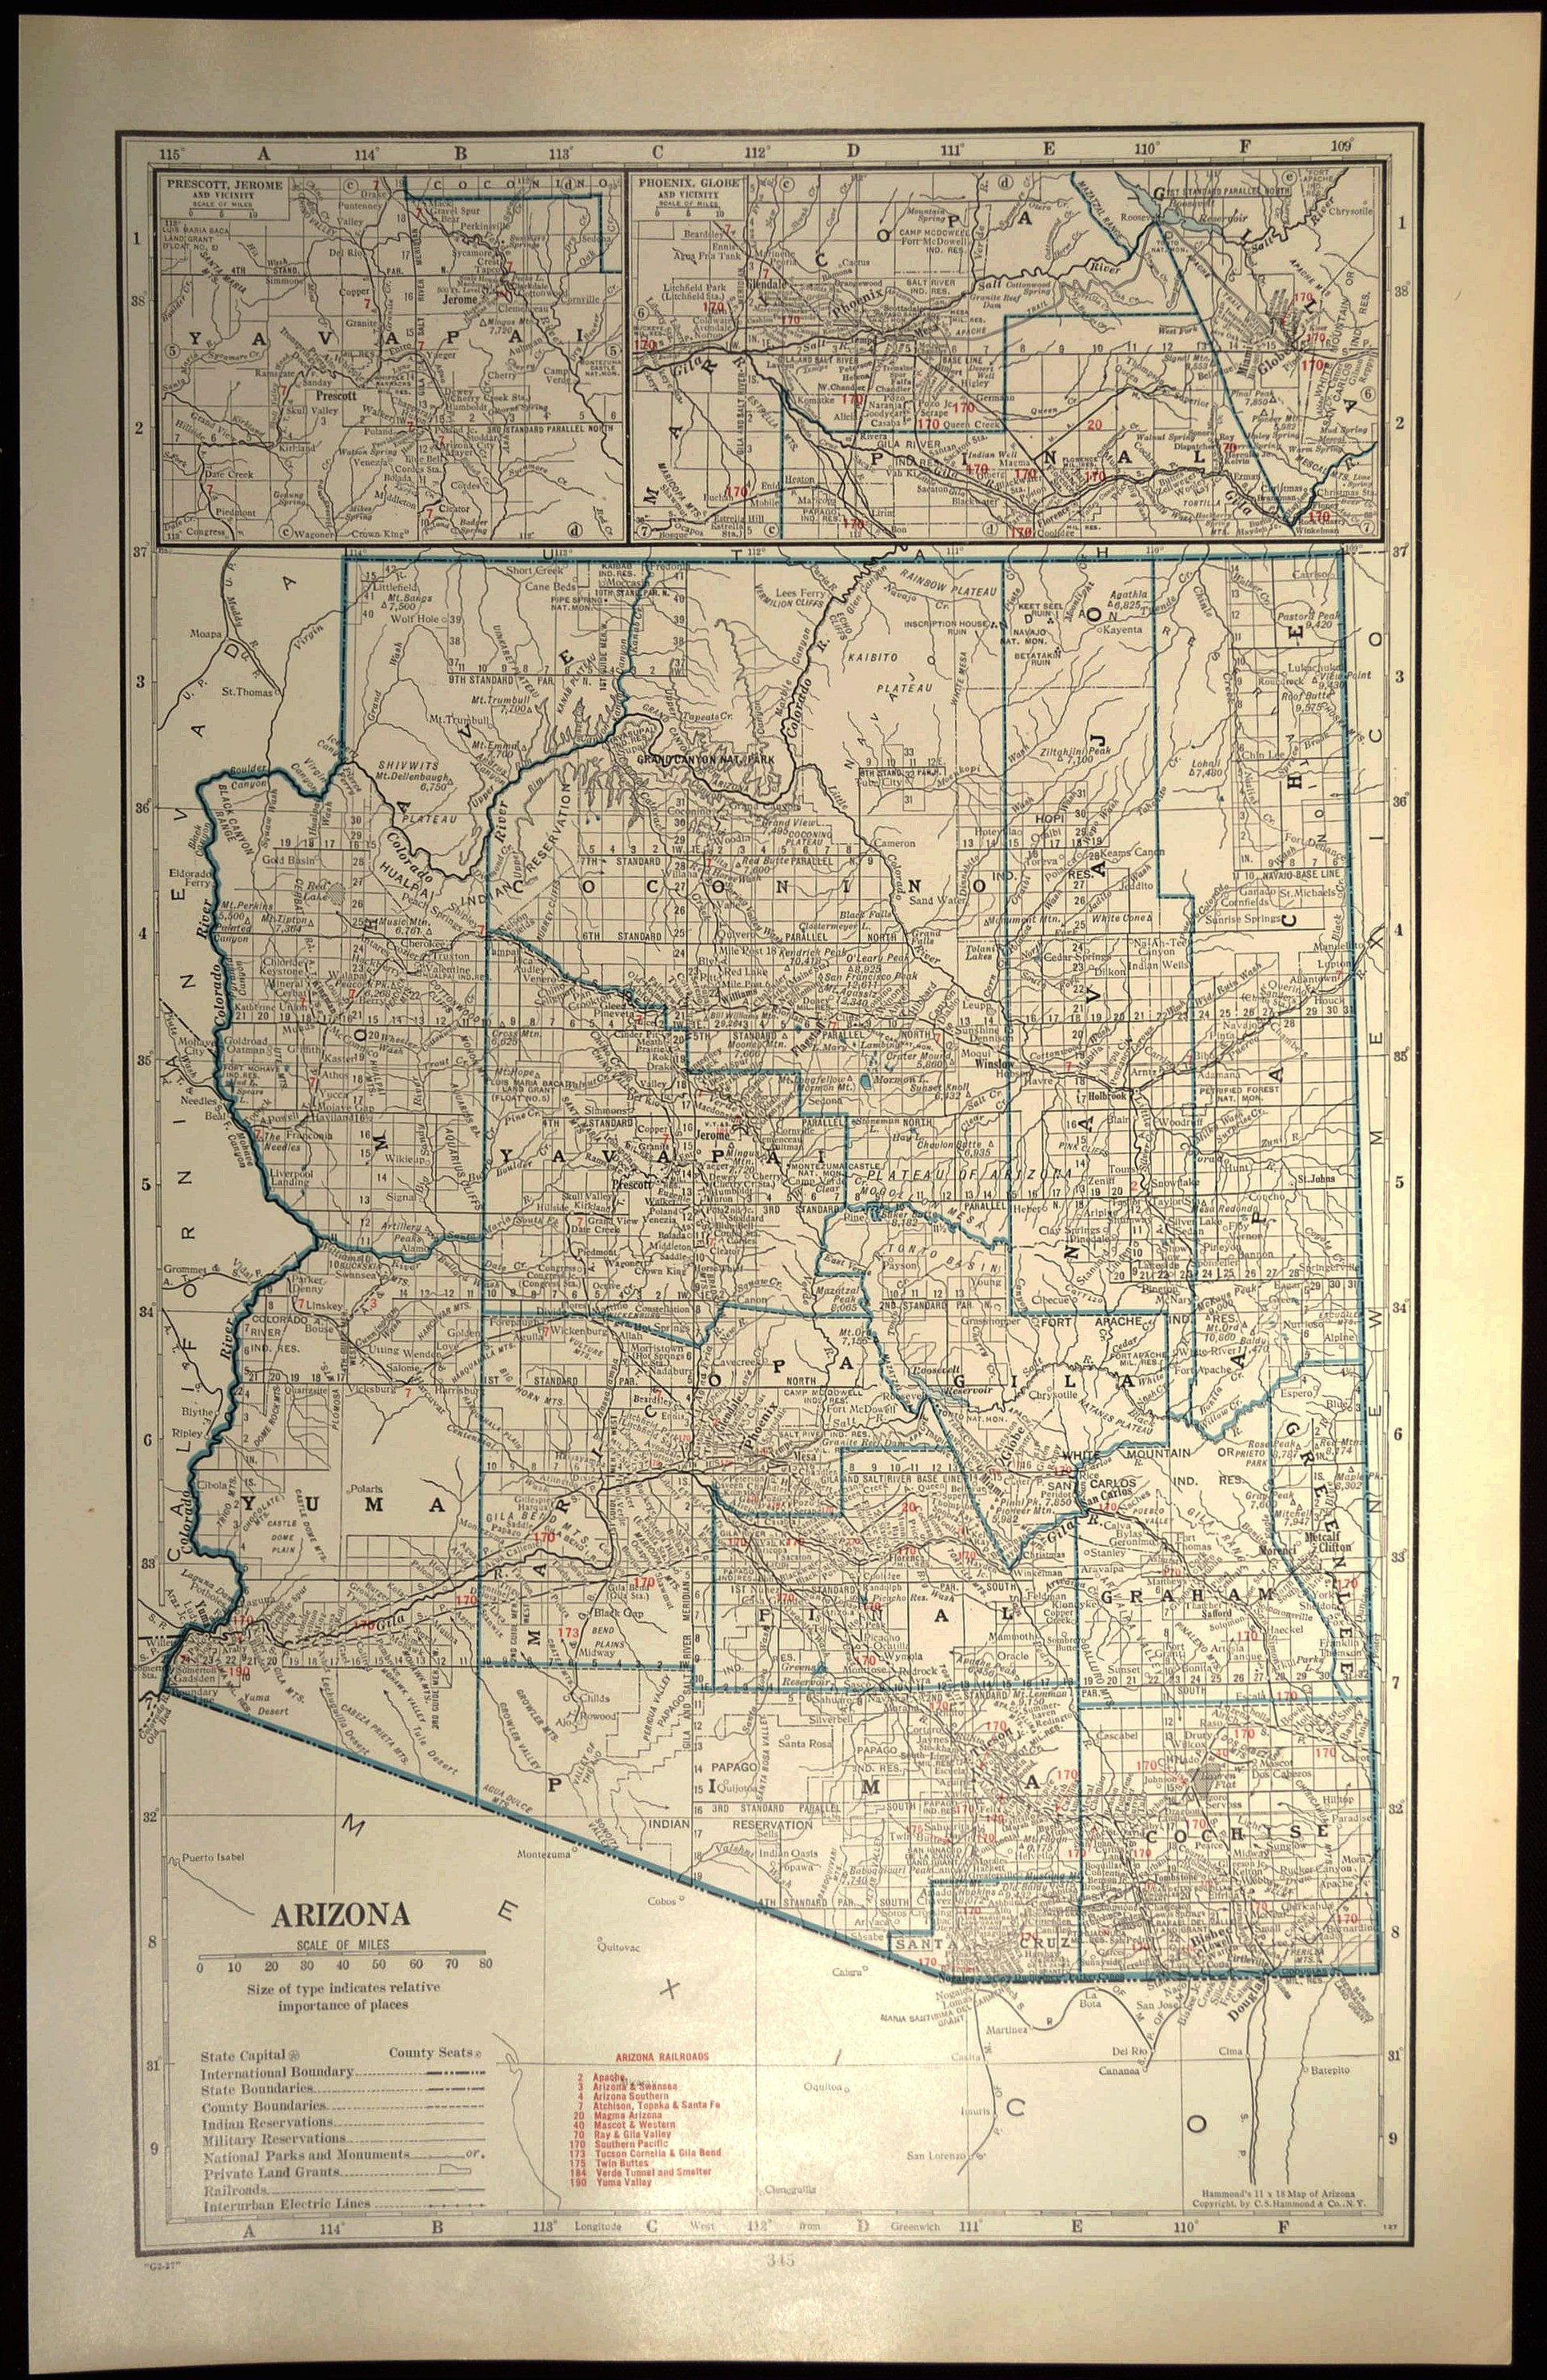 Arizona Map Of Arizona Wall Art Decor Large Railroad Map Wedding Gift Idea For Him Print Old Arizona Map Vintage Maps Map Wall Decor